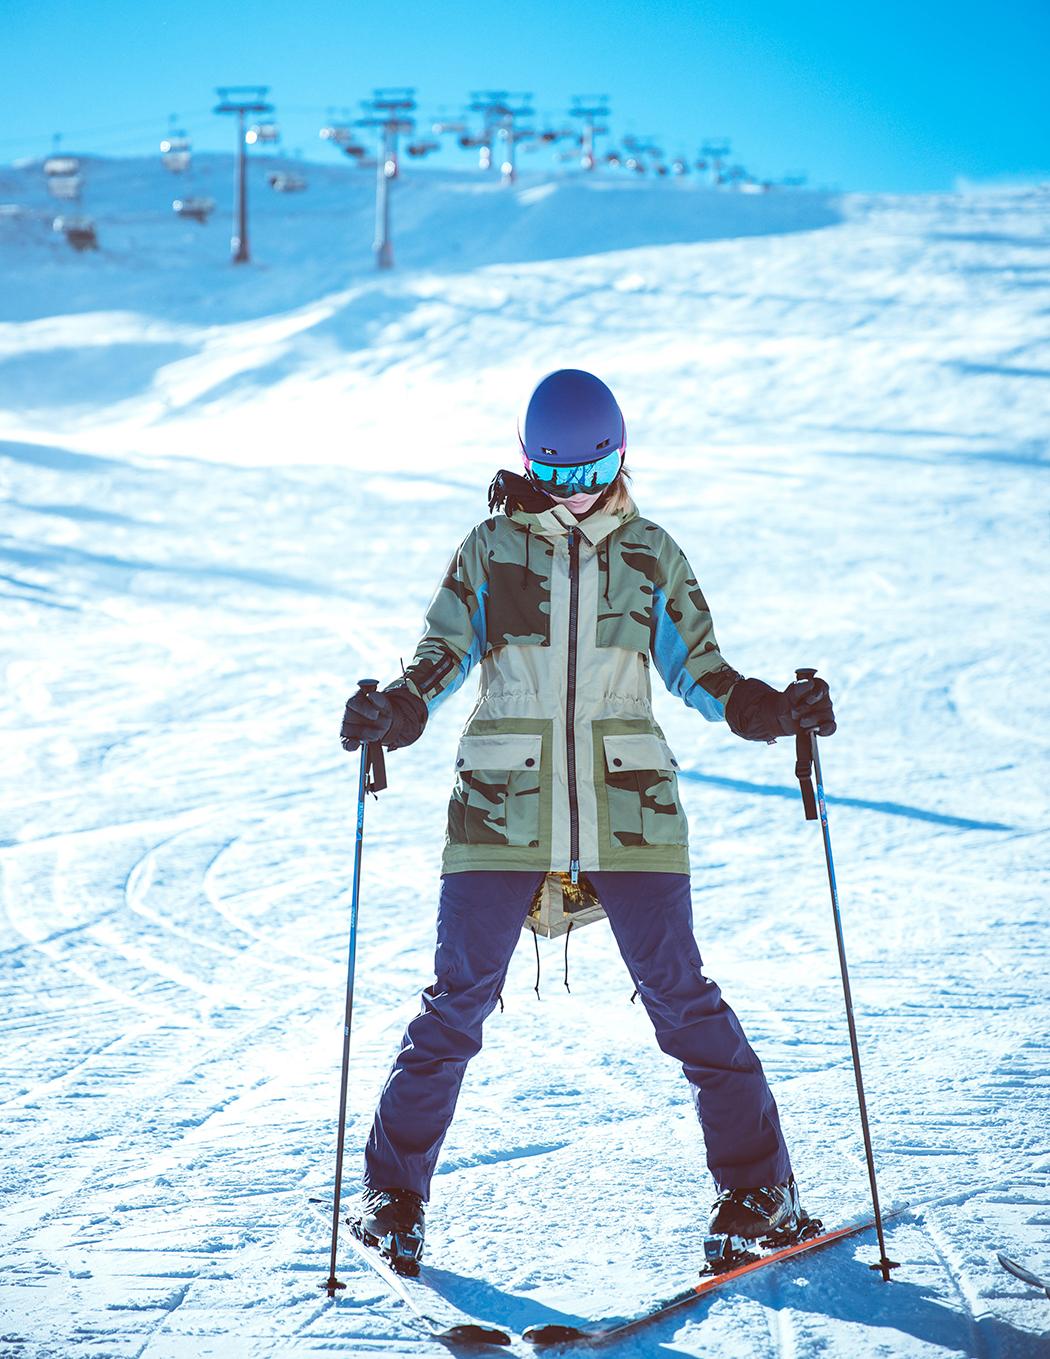 travelblog-travelblogger-travel-blog-blogger-soelden-skifahren-piste-lindarella-muenchen-deutschland-9-web